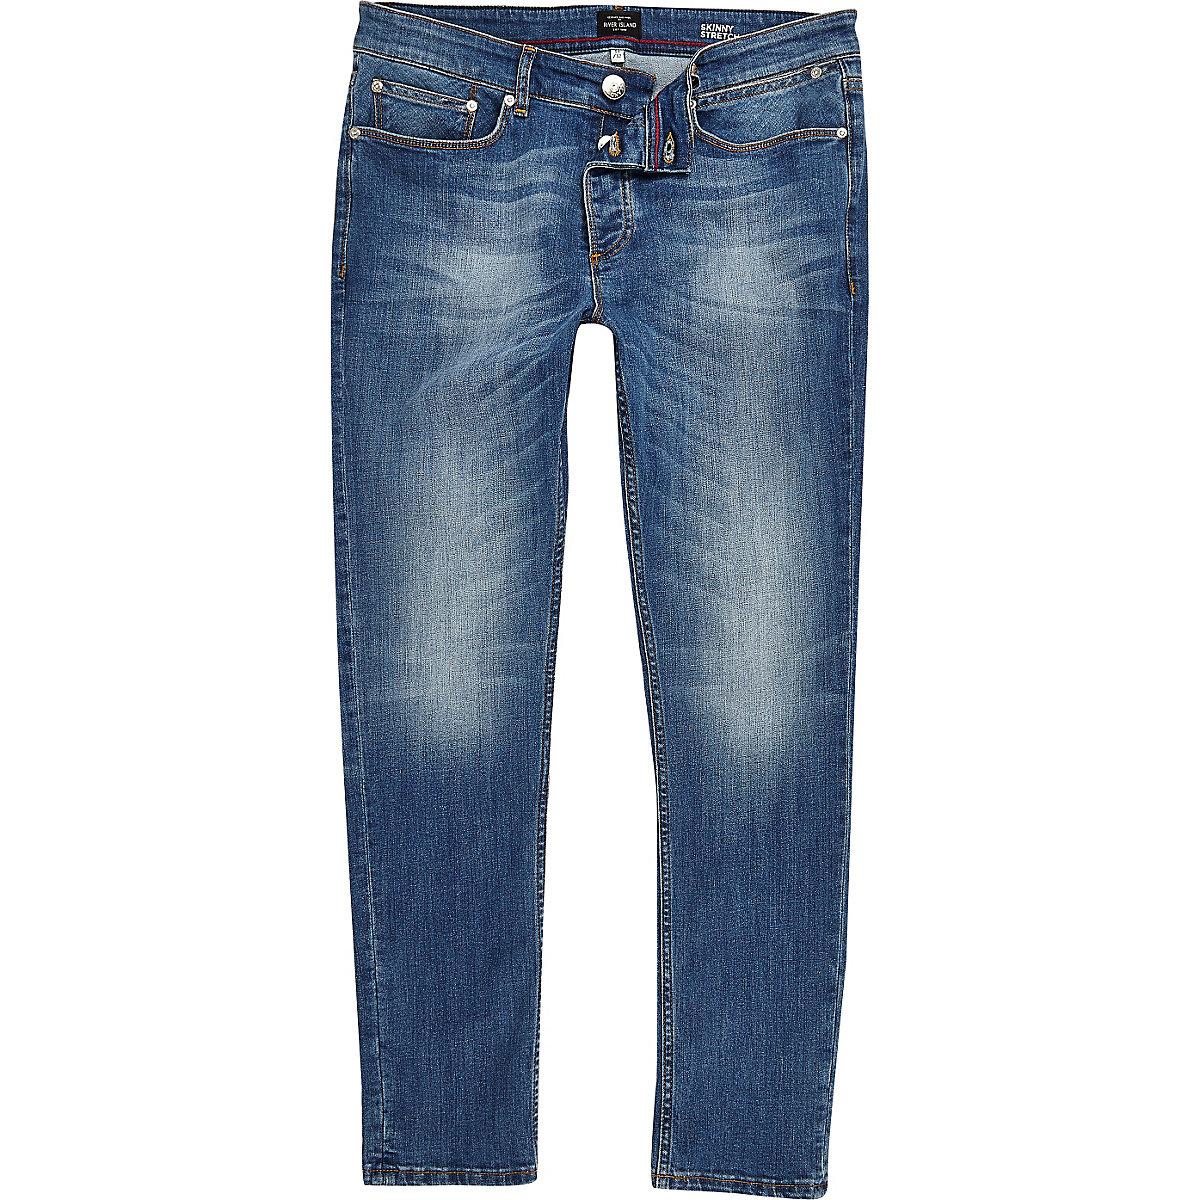 Sid - Middenblauwe wash skinny jeans